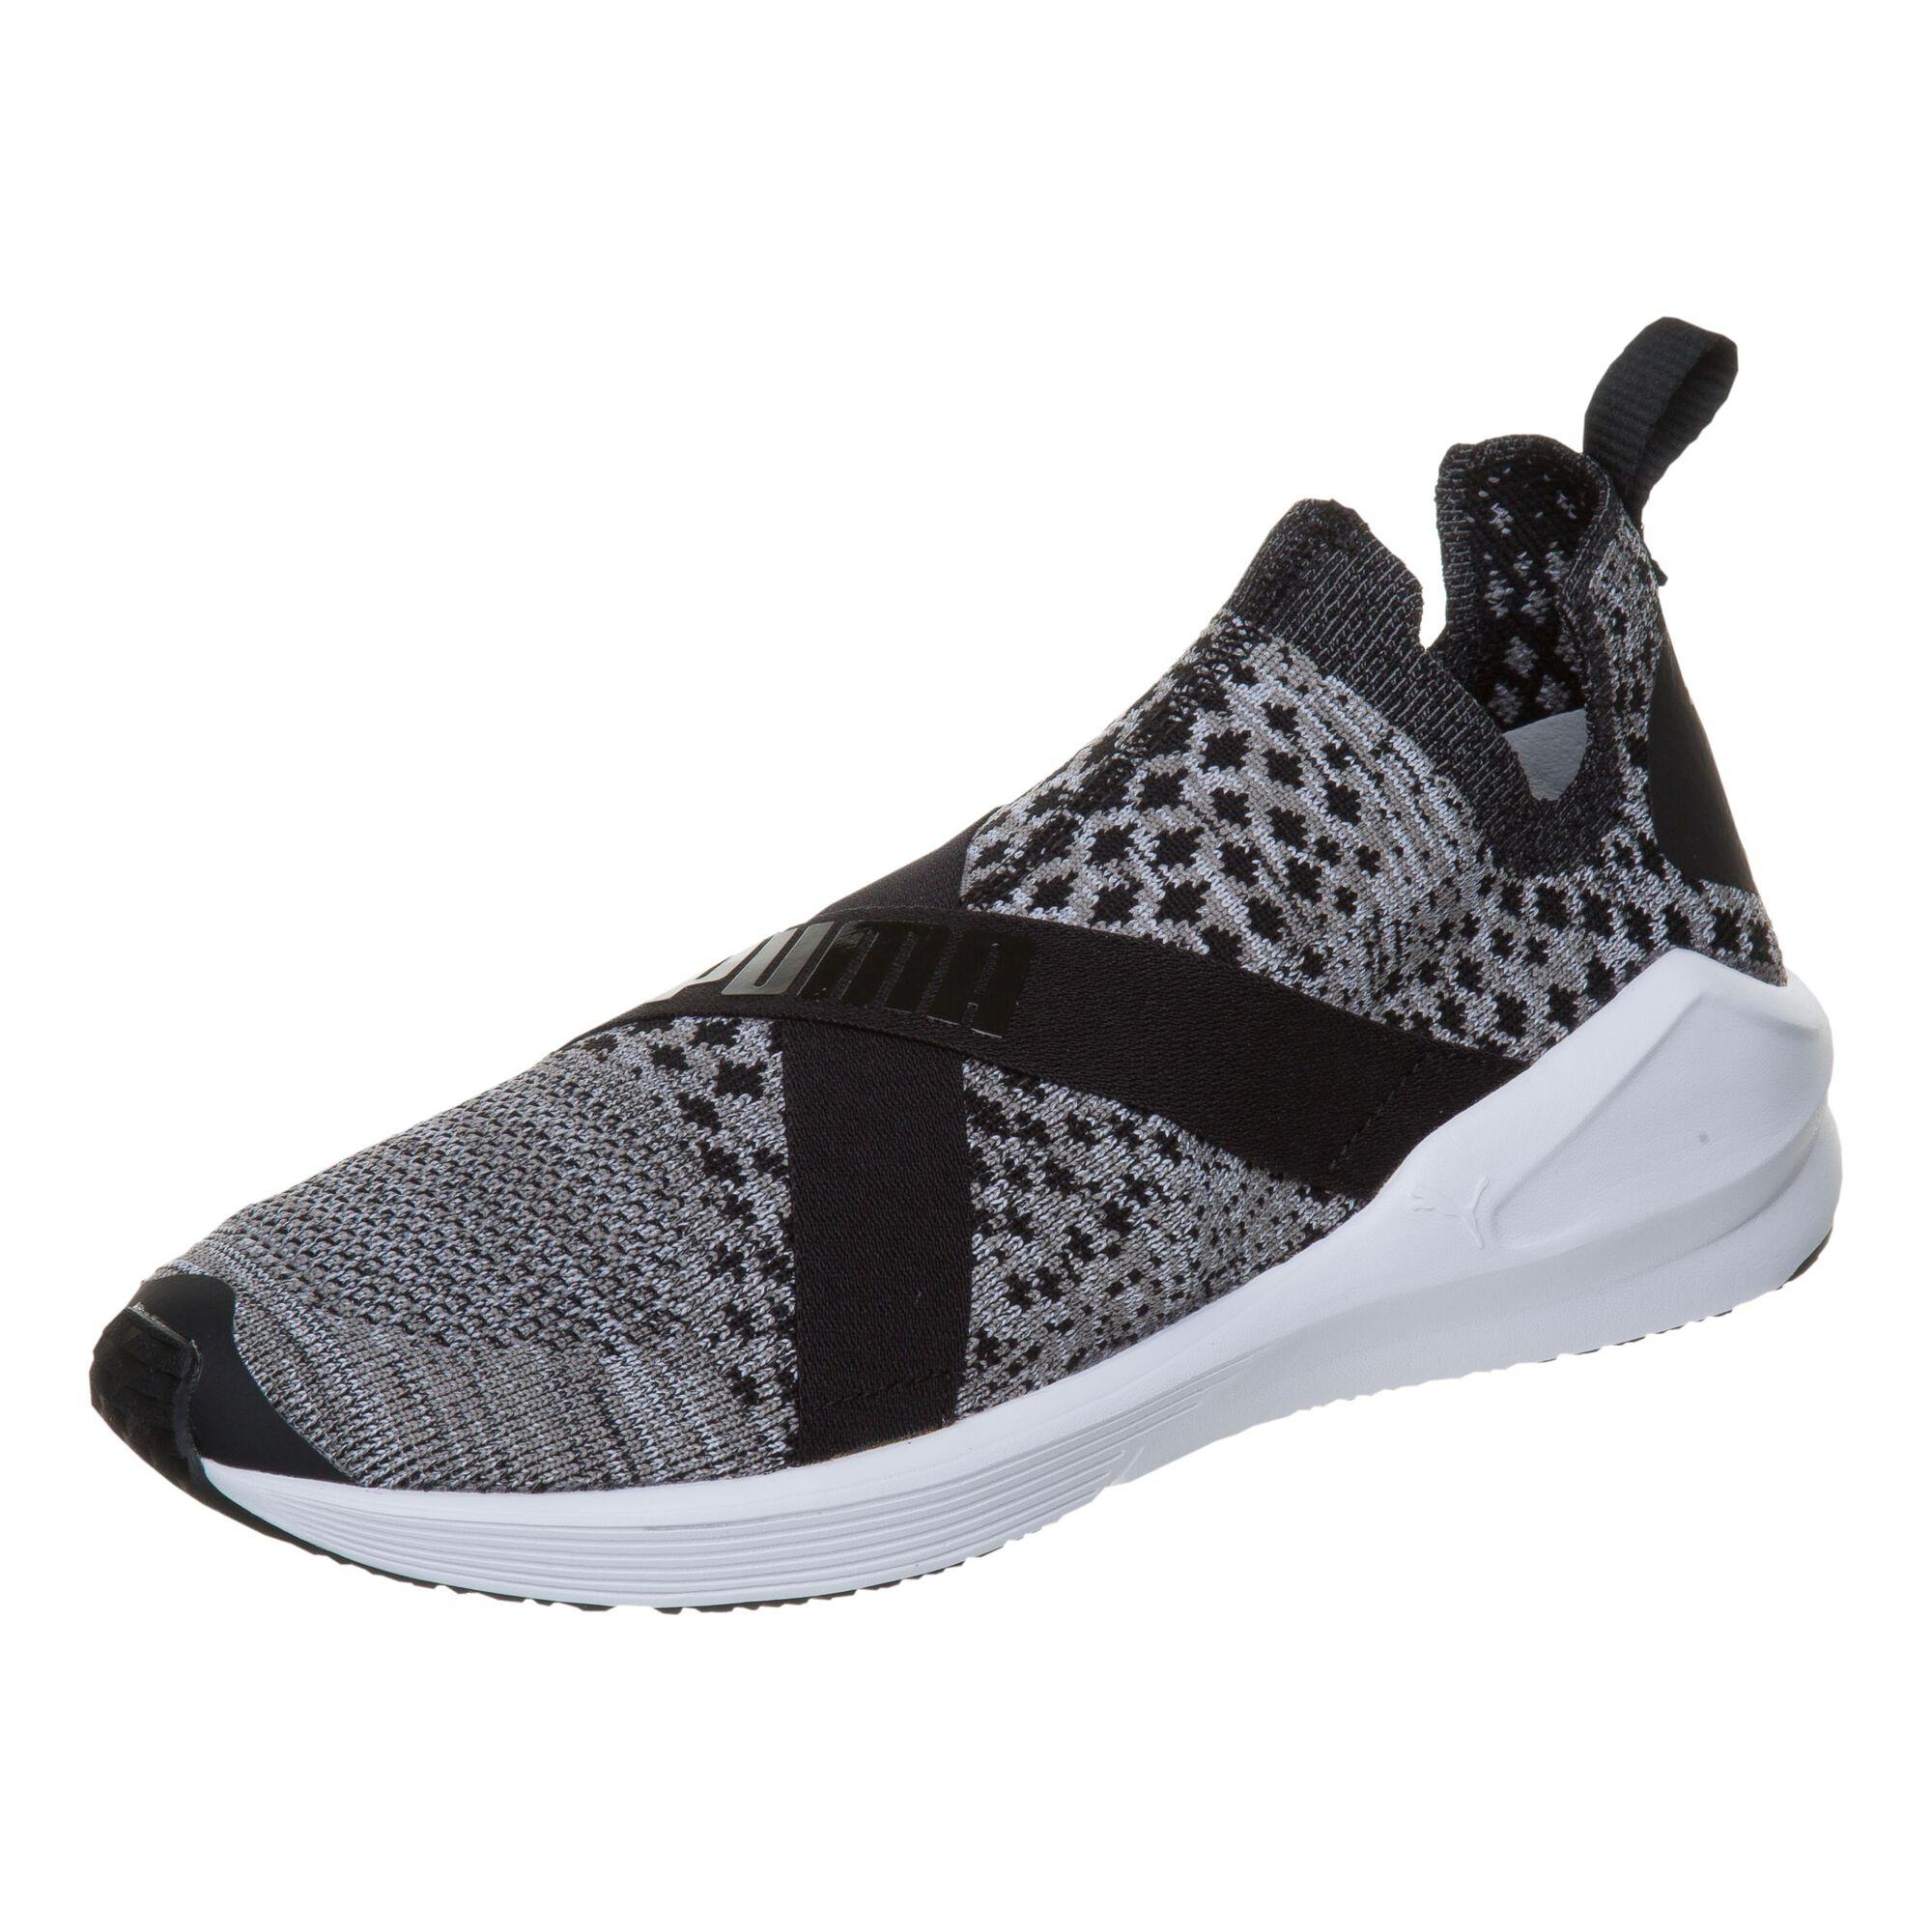 7af20e7ab4303f buy Puma Fierce EvoKNIT Fitness Shoe Women - Lightgrey